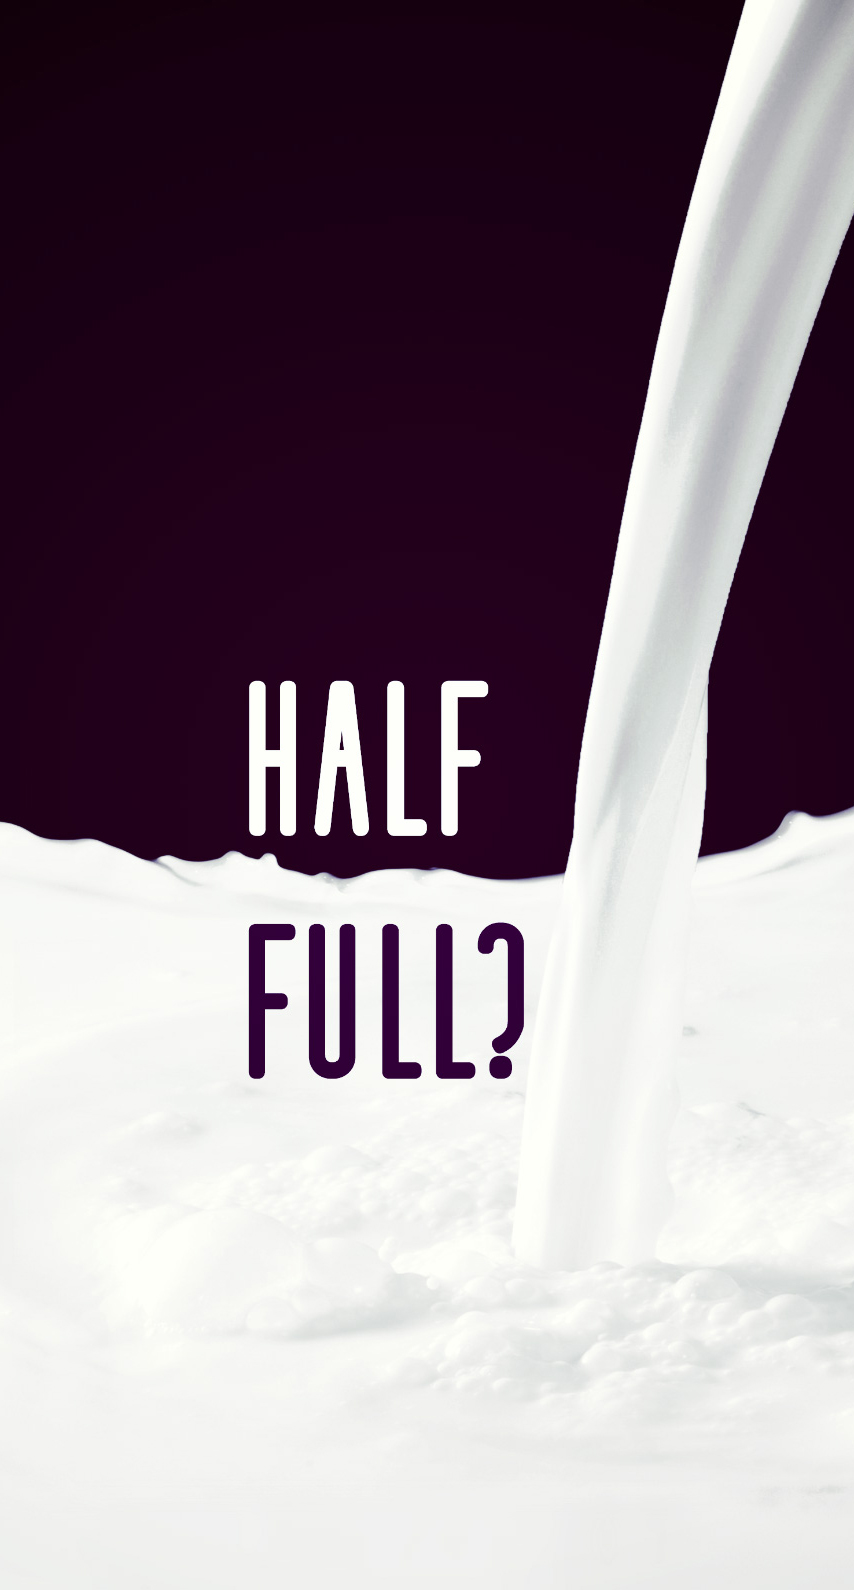 milk, yogurt, calcium, creamy, milkshake, crown, lactose, cream, fluid, dairy, spurt